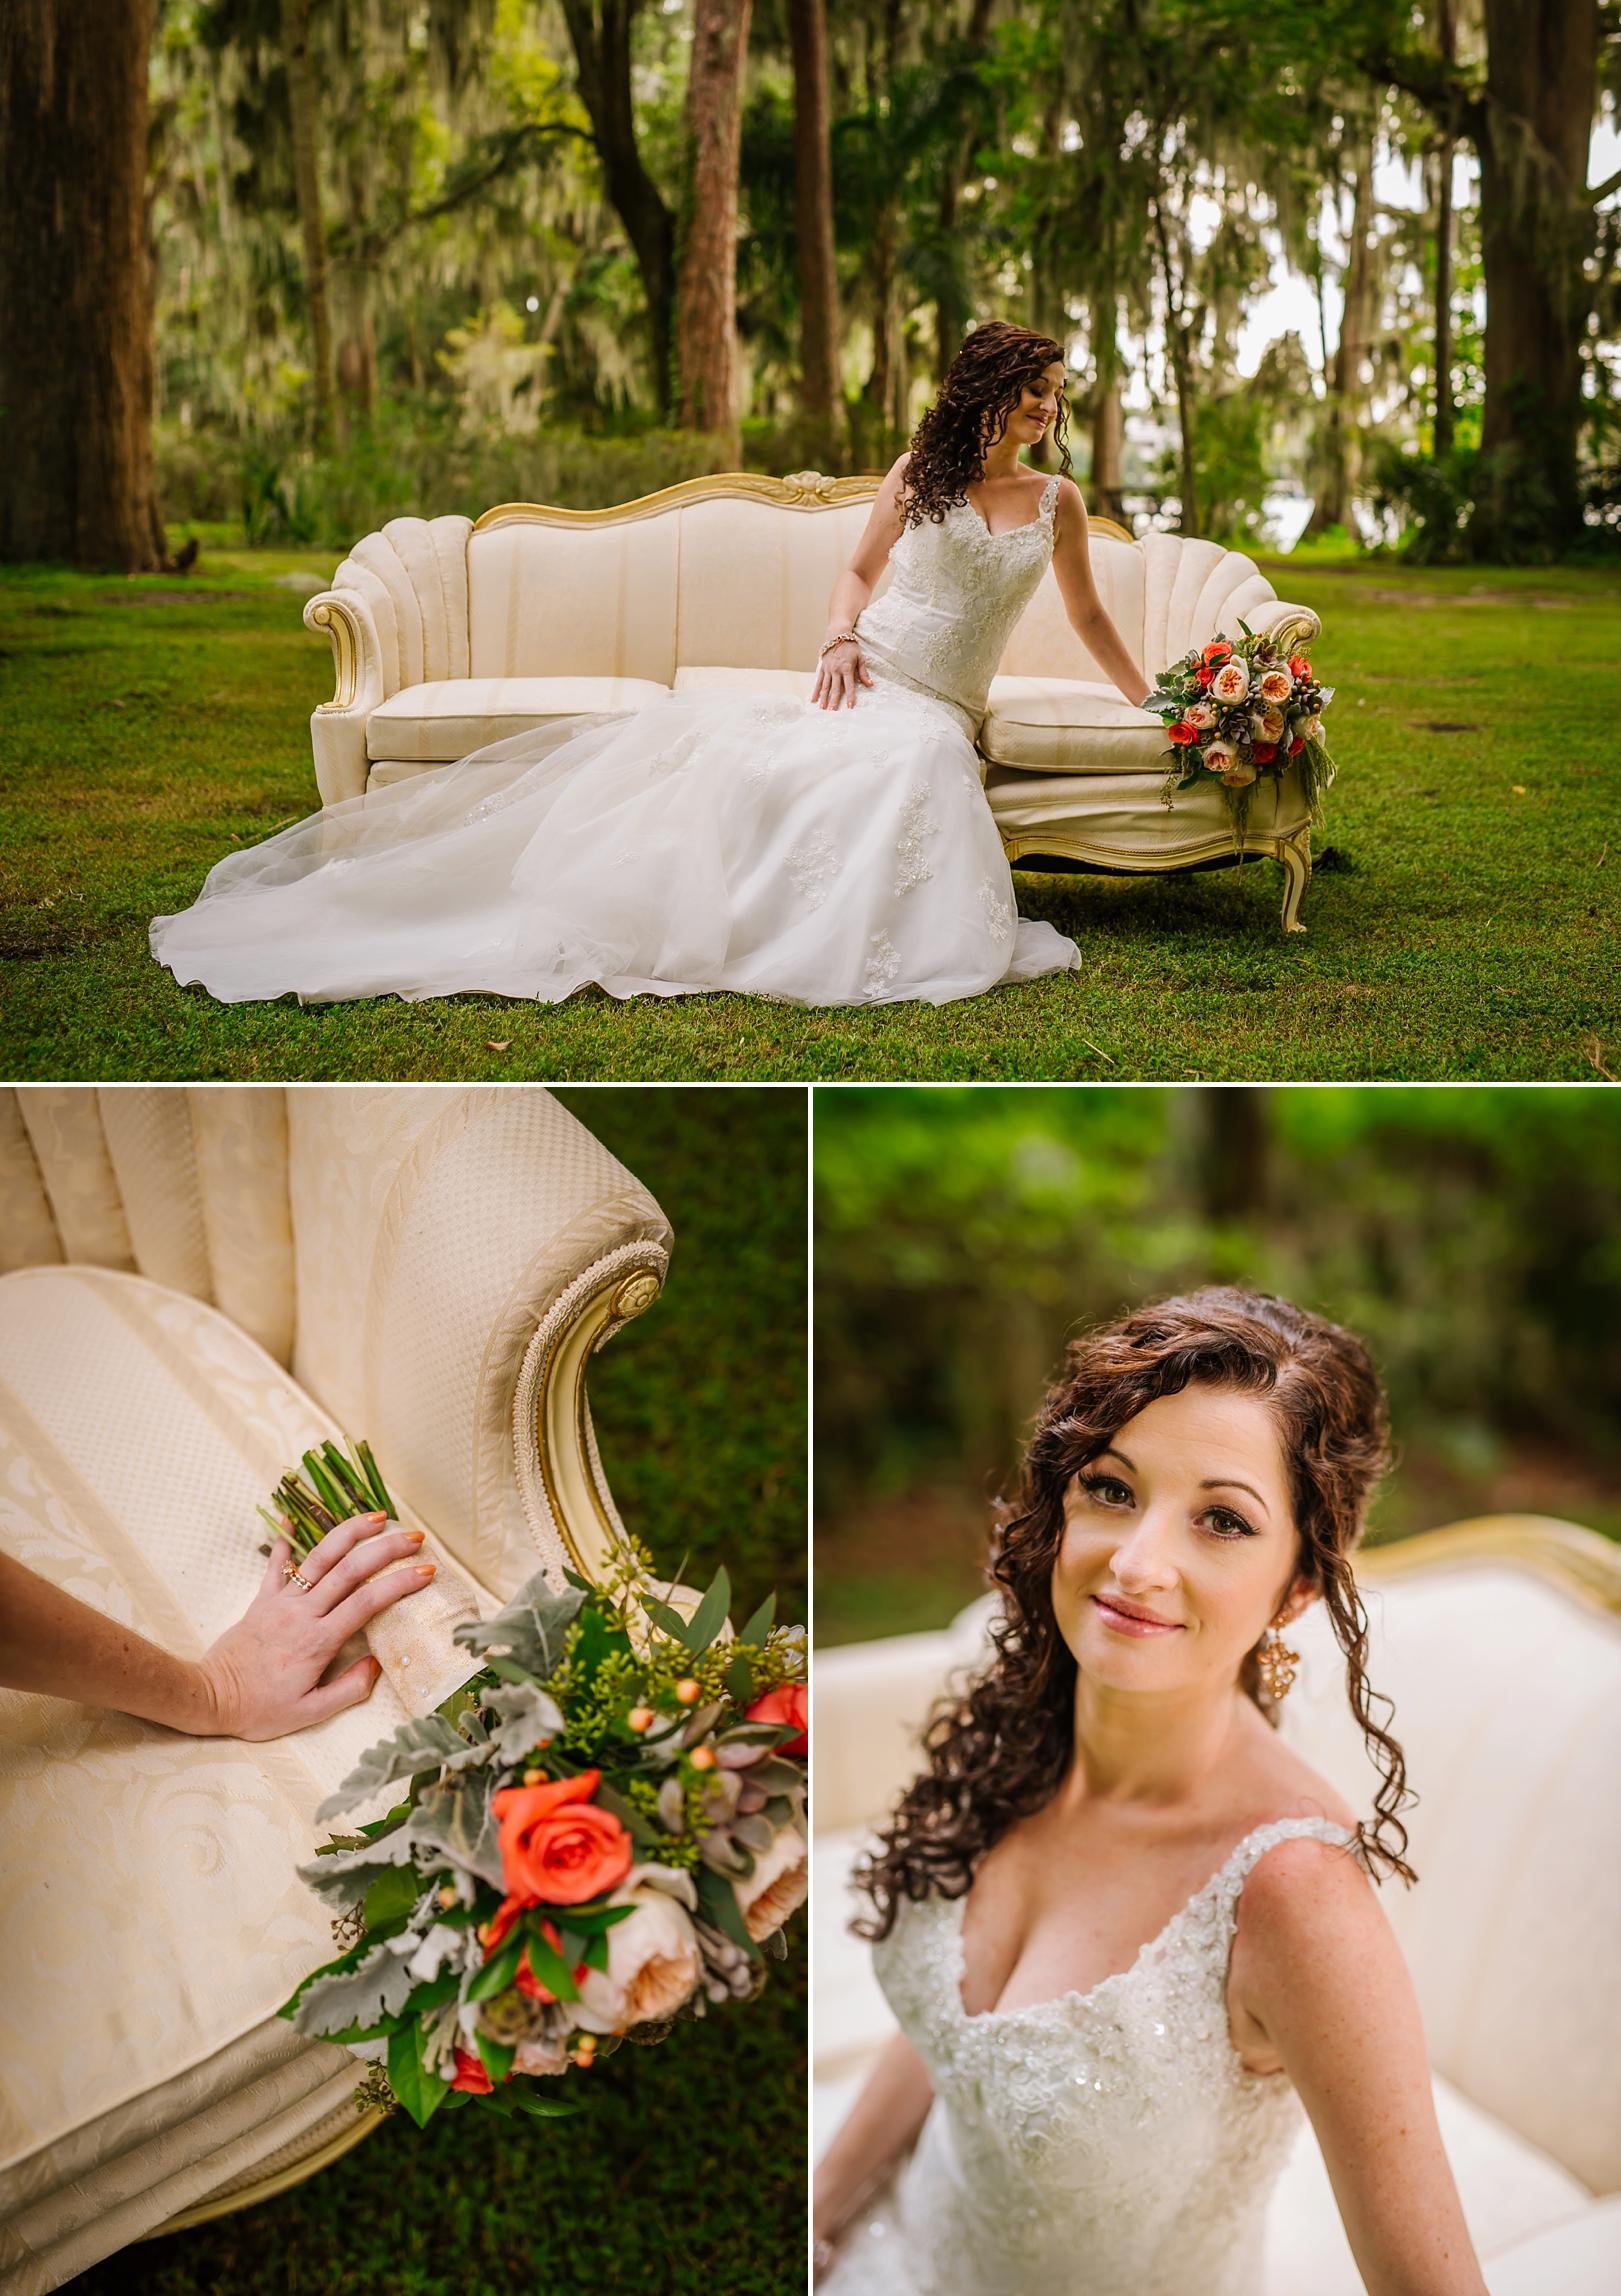 kraft-azalea-gardens-stylish-elopment-wedding-photography_0017.jpg